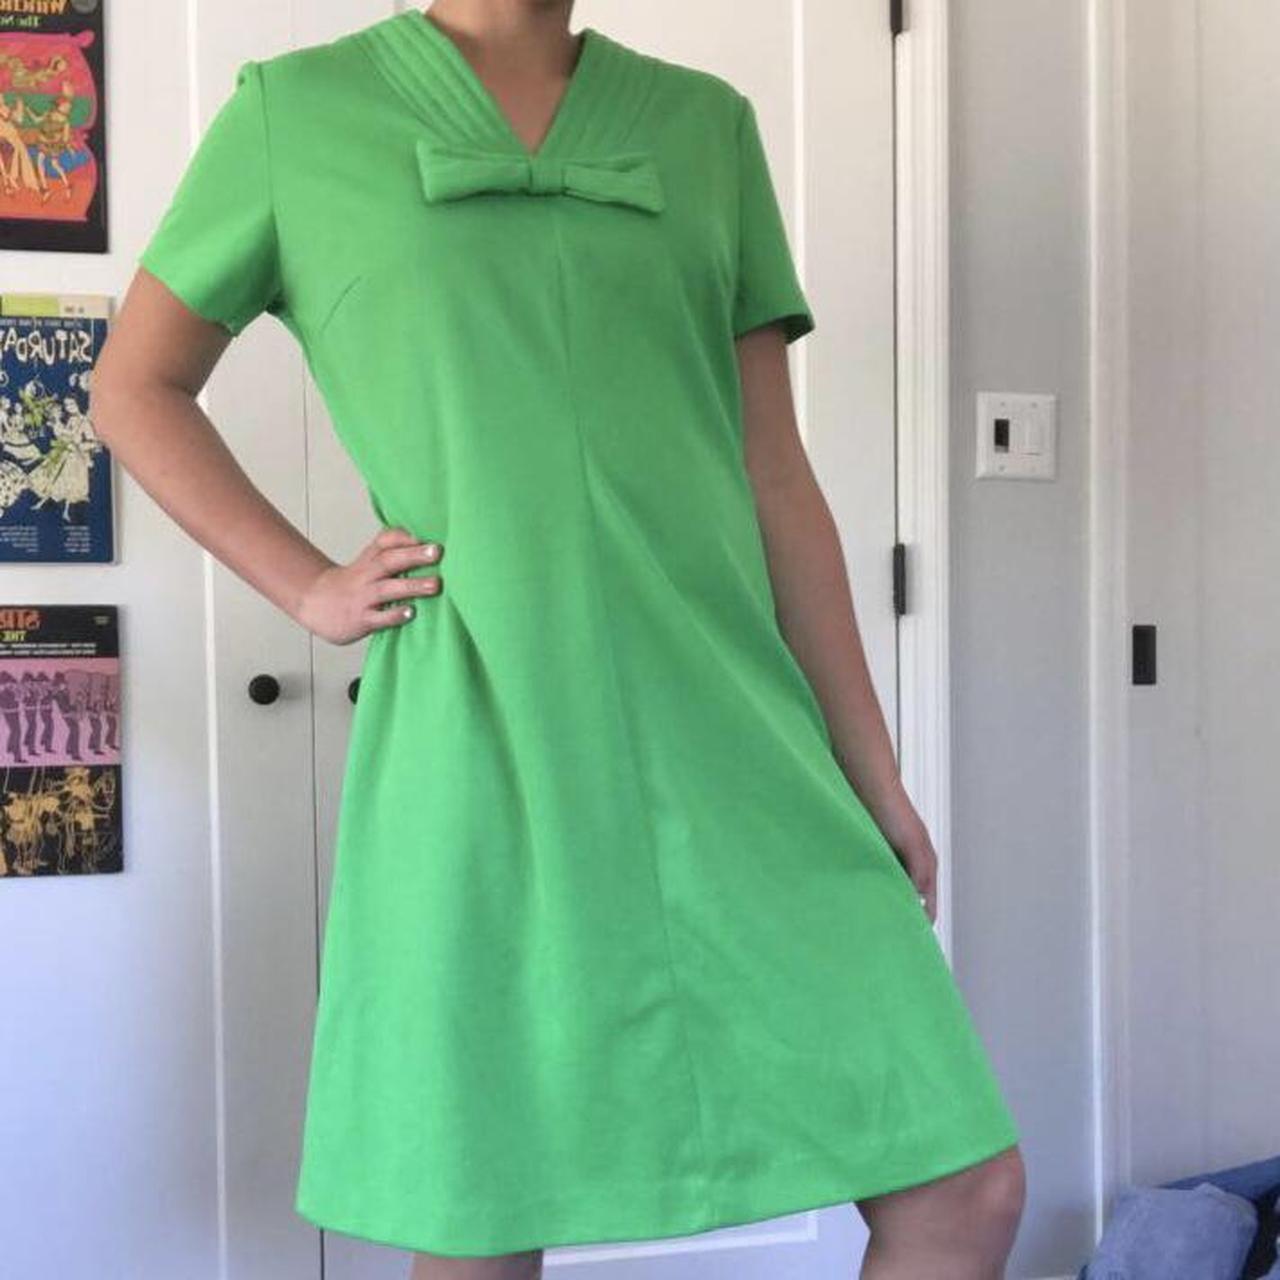 Product Image 1 - Vintage green Flutterbye dress ☘️ Has